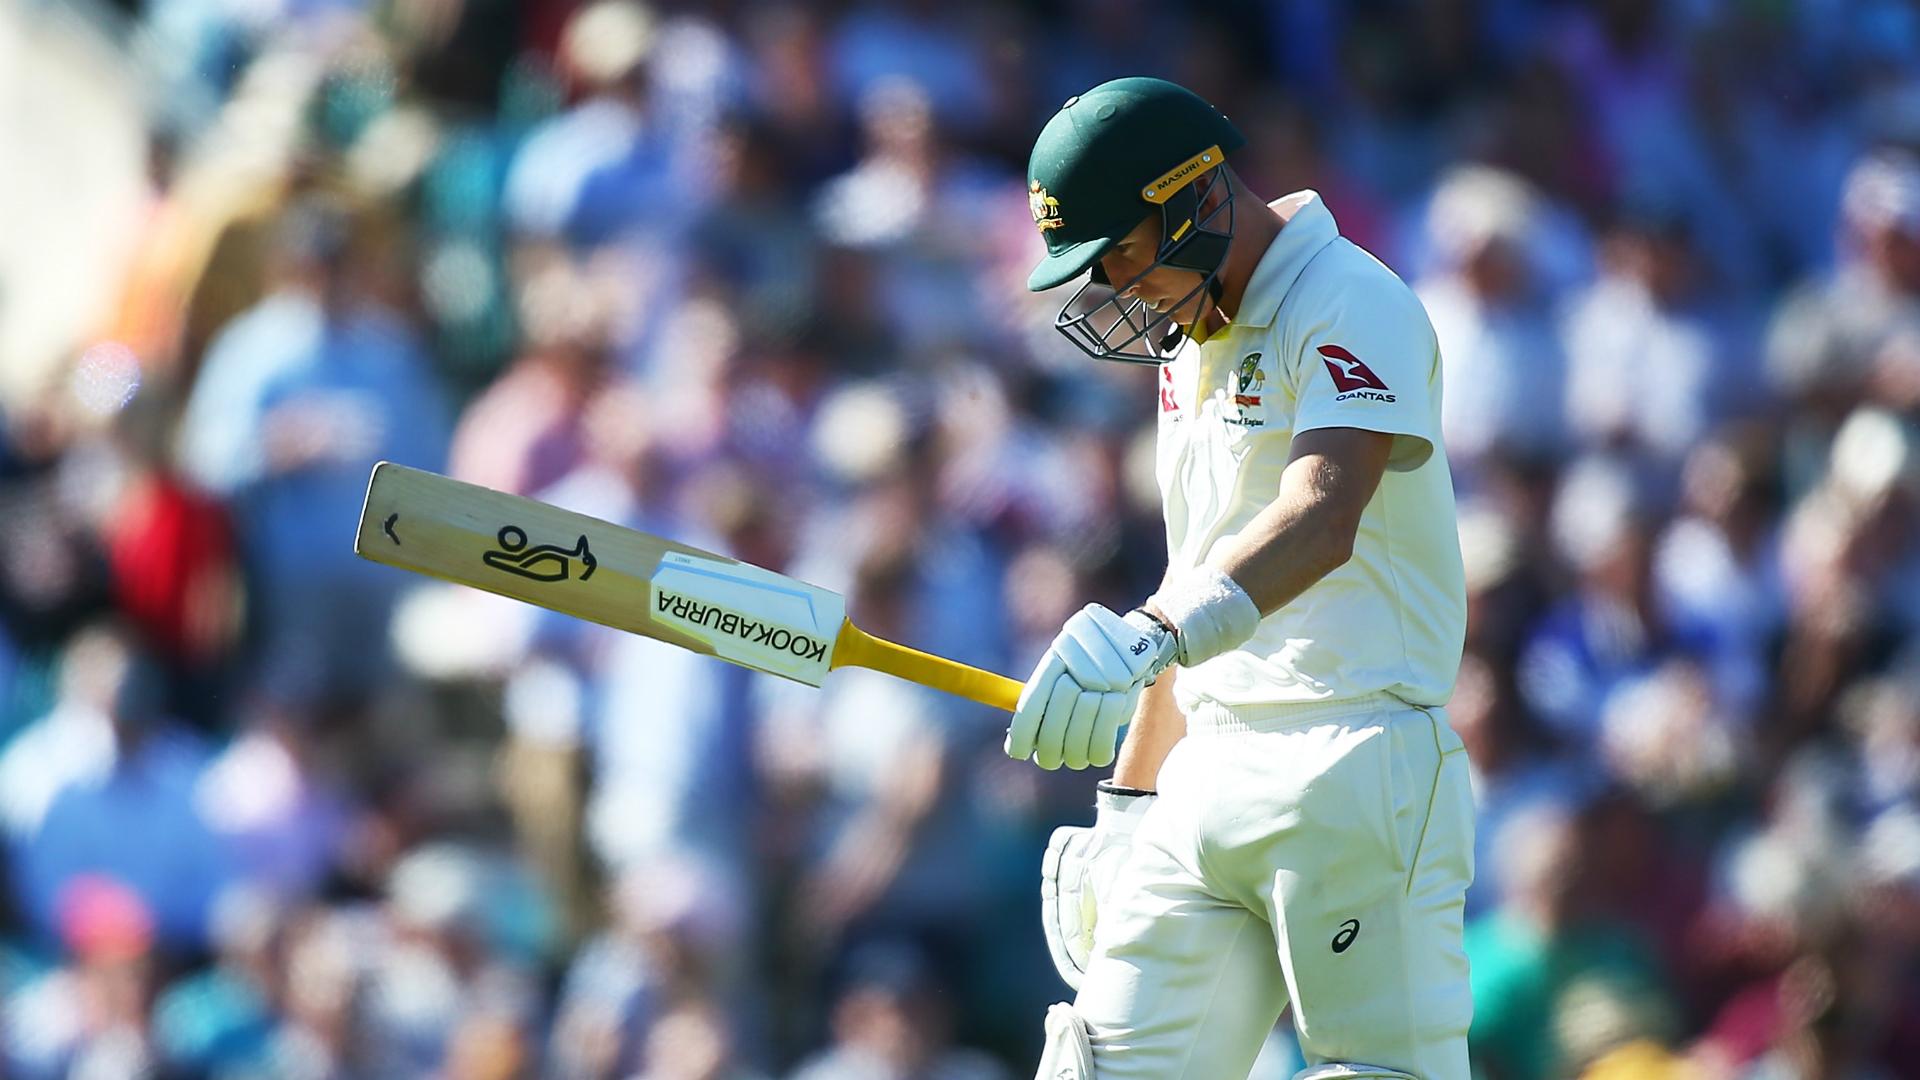 Ashes 2019: Marnus Labuschagne denies Australia's intensity has dropped